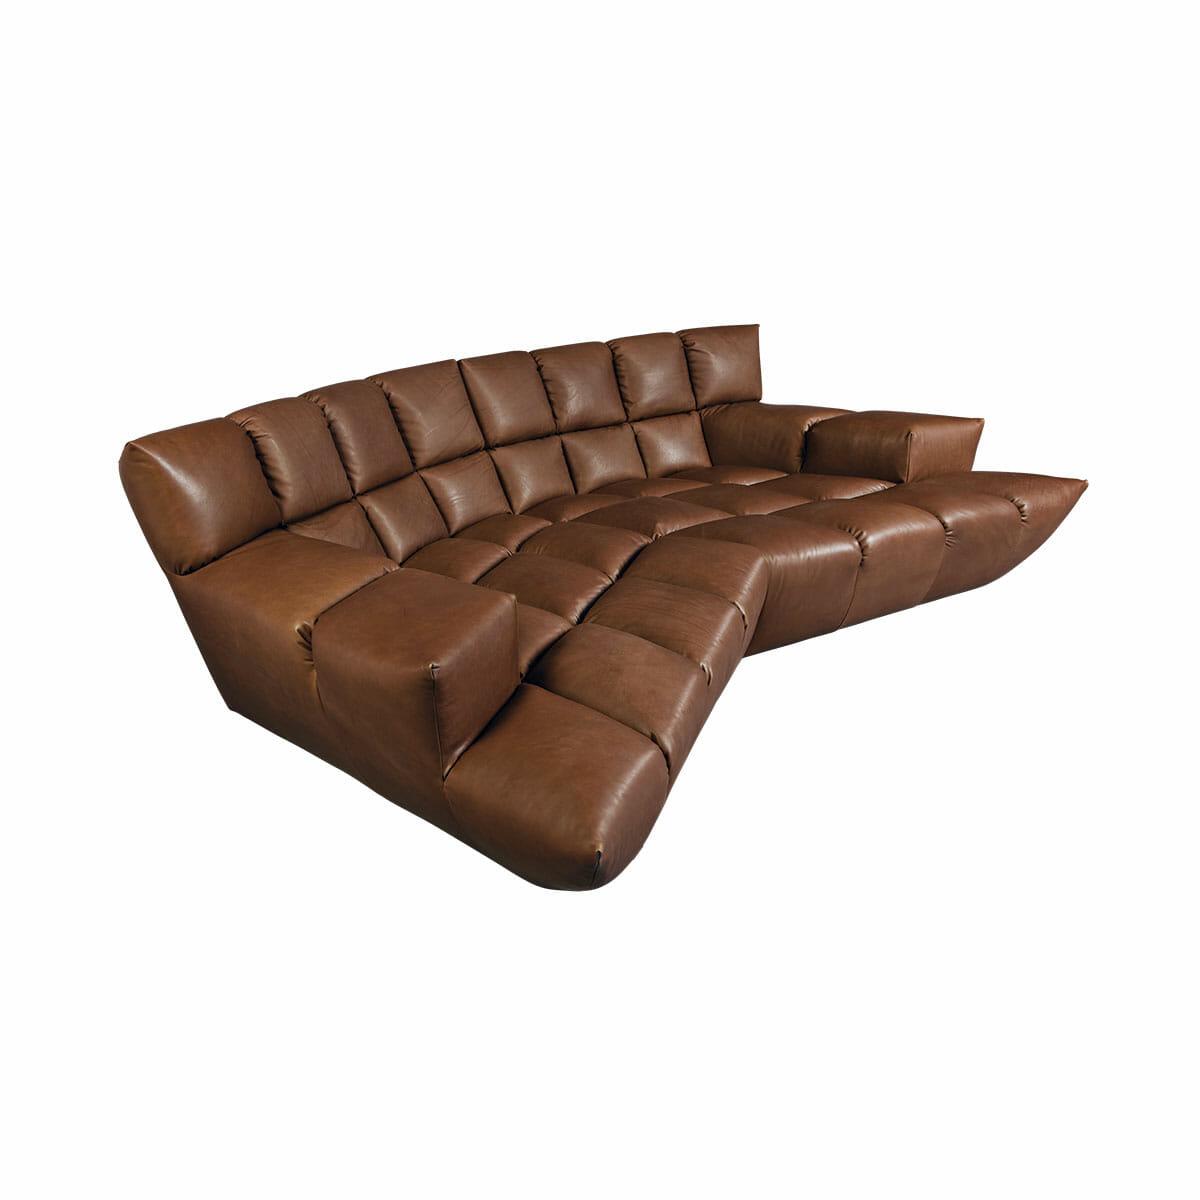 cloud 7 by bretz top angebot an bretz cloud 7 sofas ab. Black Bedroom Furniture Sets. Home Design Ideas